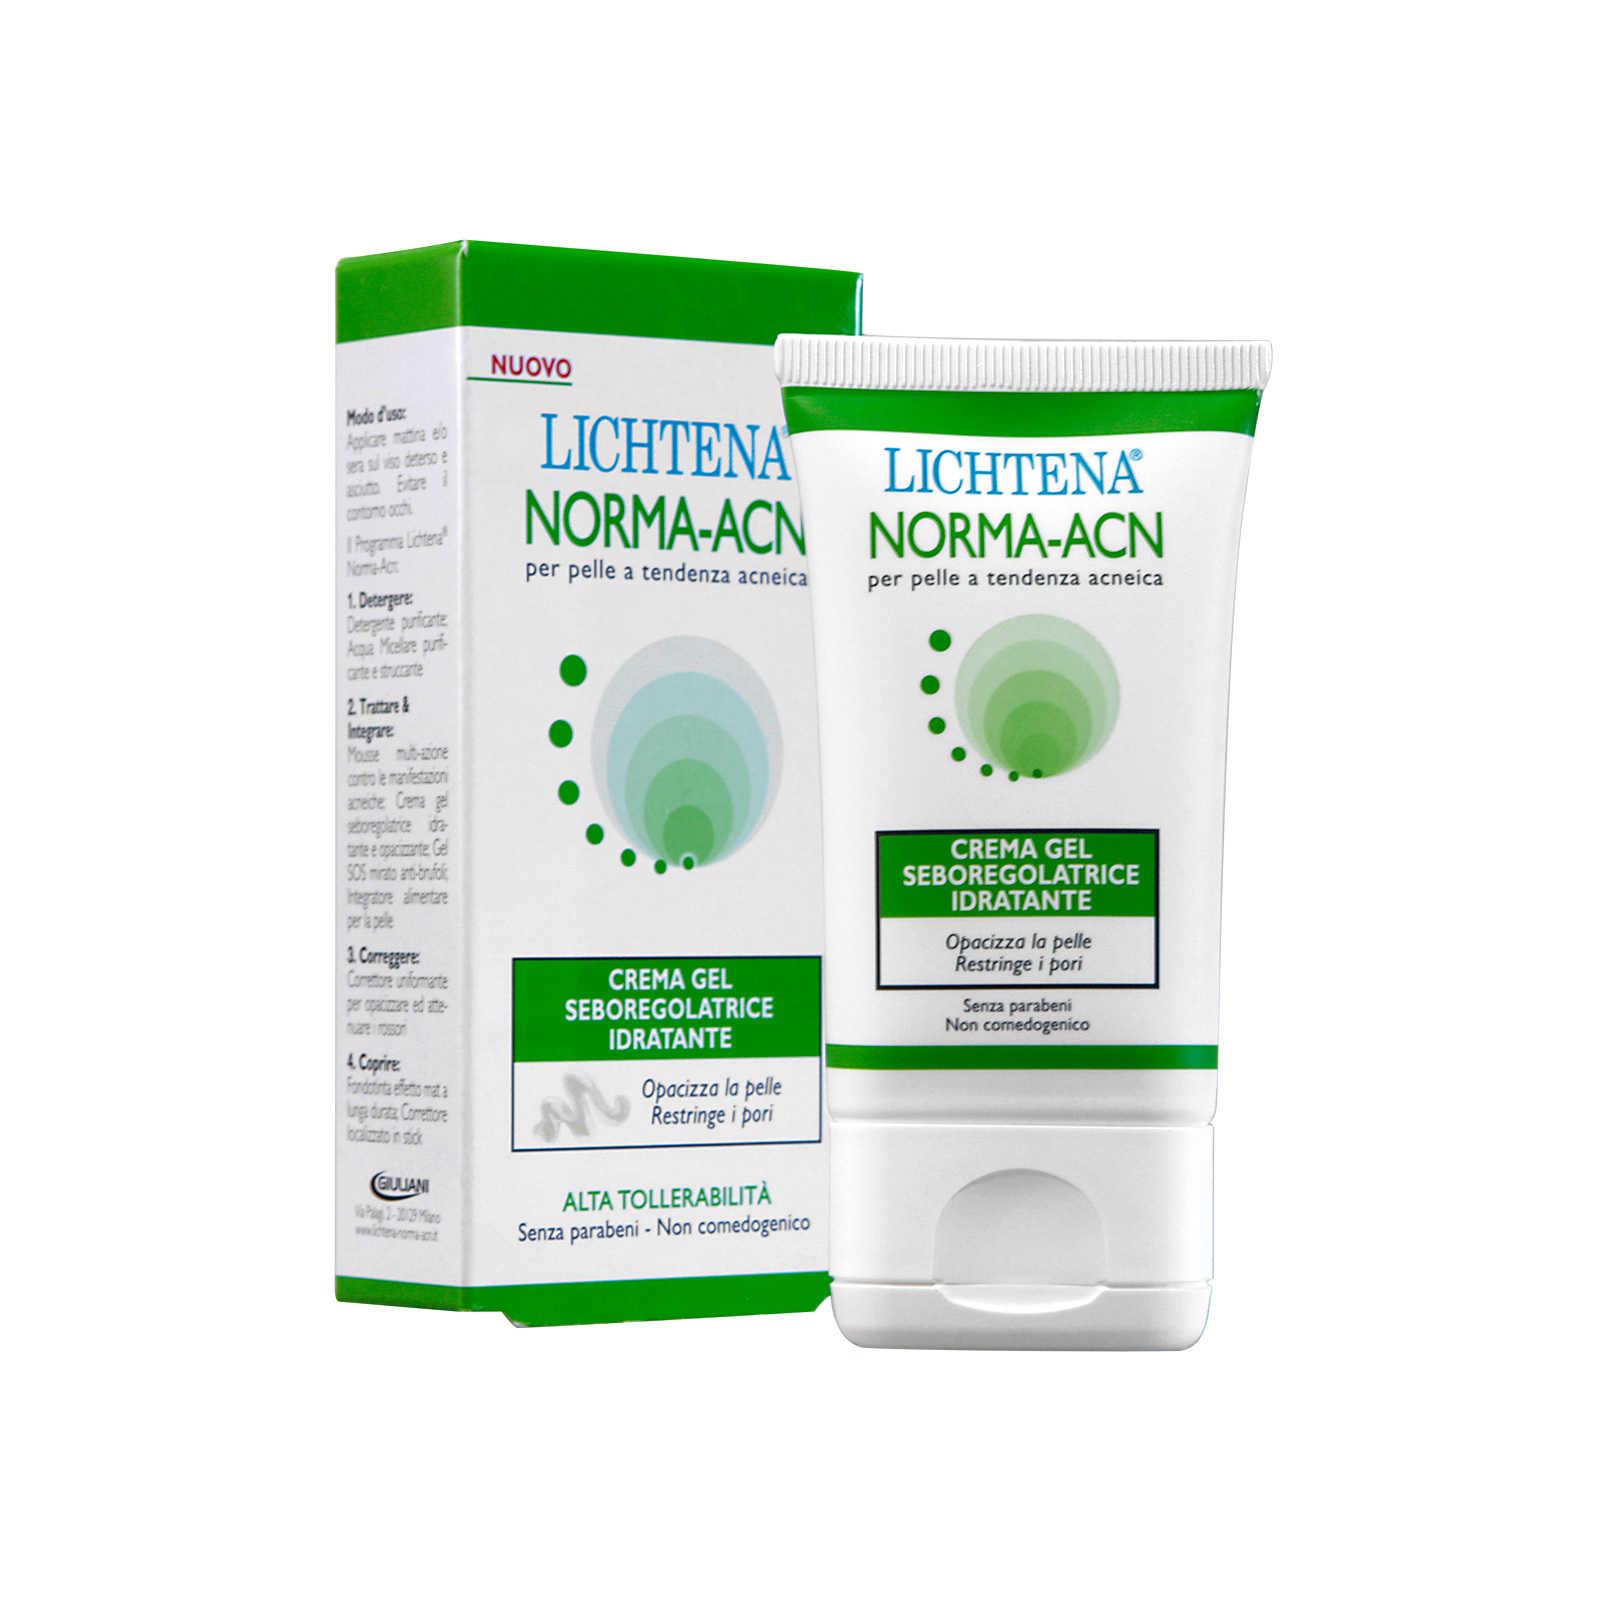 Lichtena - Crema Gel seboregolatrice idratante - Norma-Acn